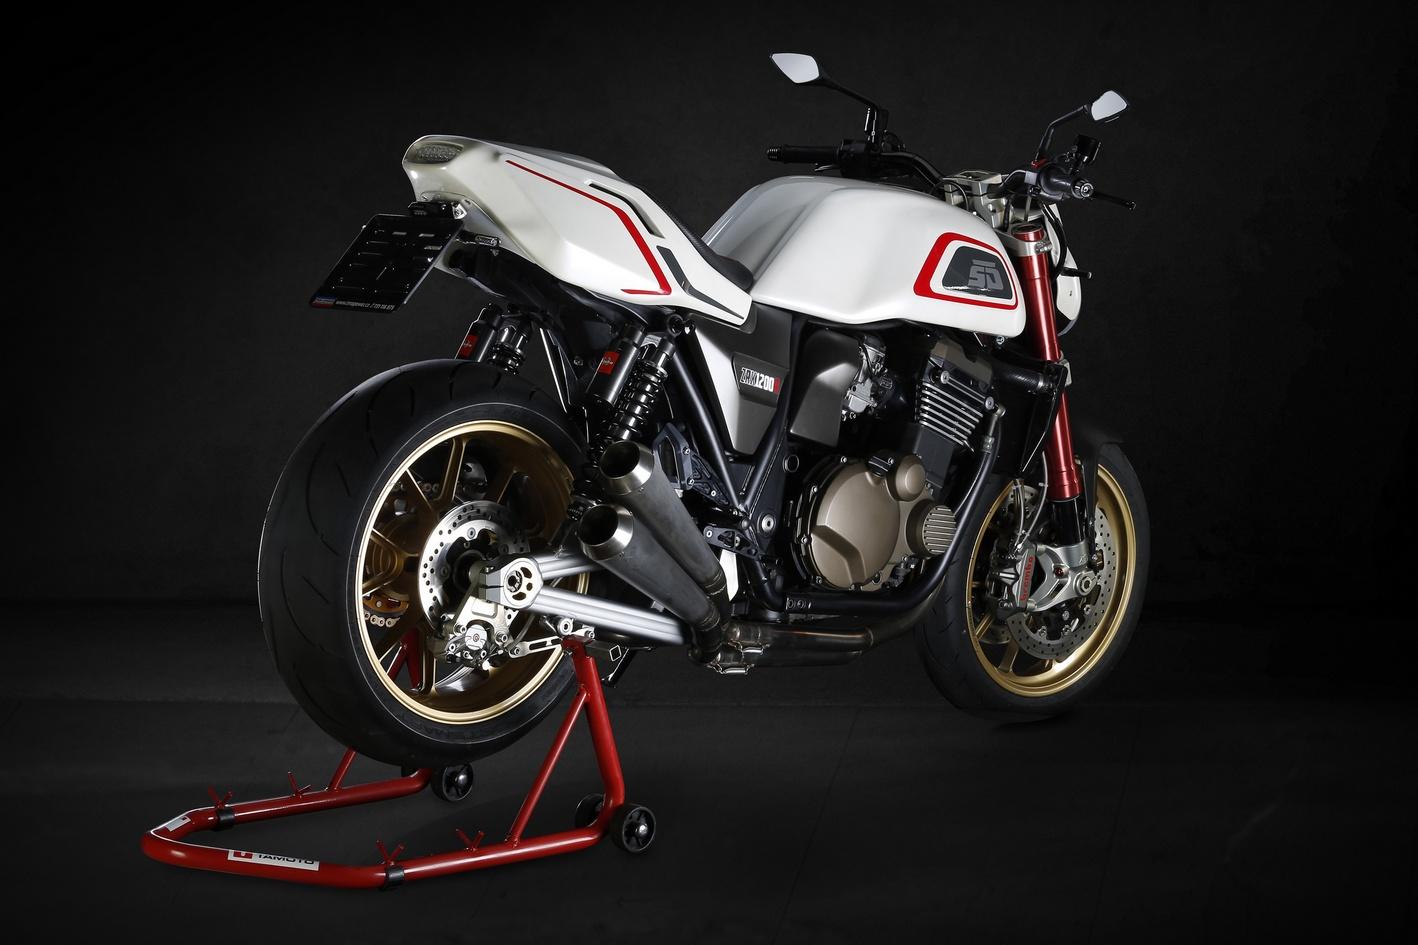 Kawasaki Zrx1200r By Skoda Design Rocketgarage Cafe Racer Magazine